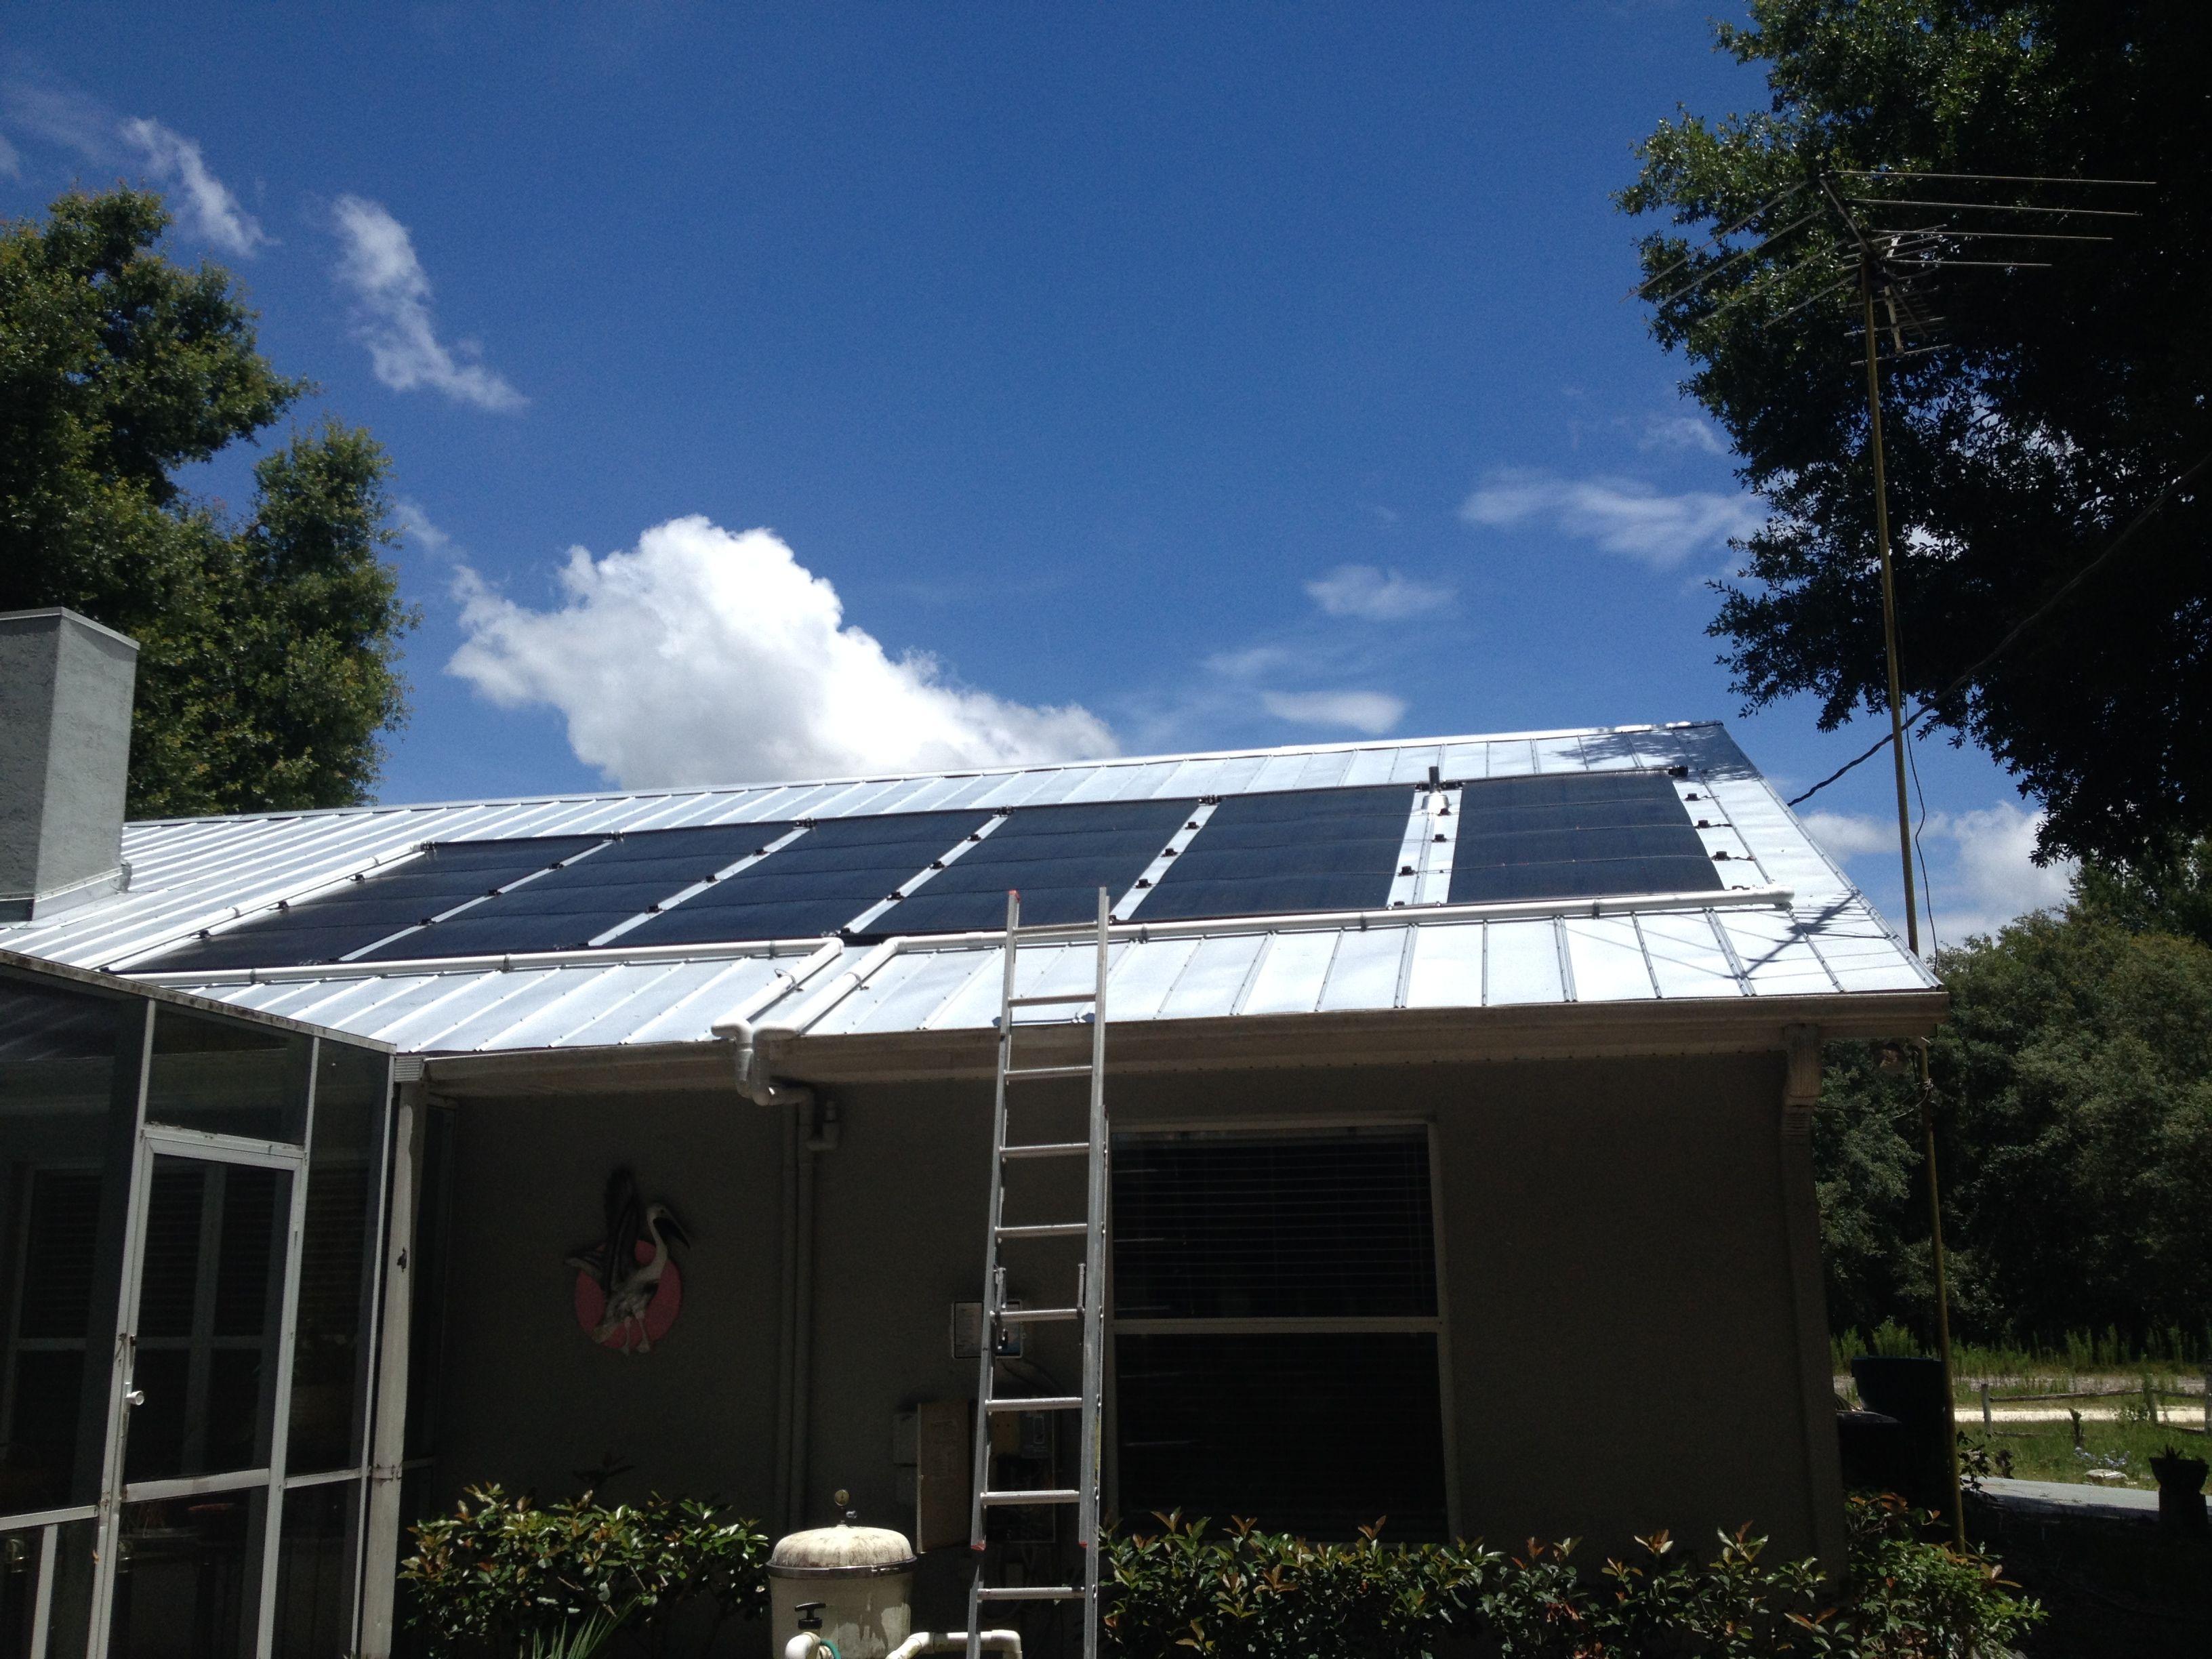 Vortex Solar Pool Heater Www Diysolarpoolheaterkits Com With Images Solar Pool Heating Solar Pool Heater Pool Heaters